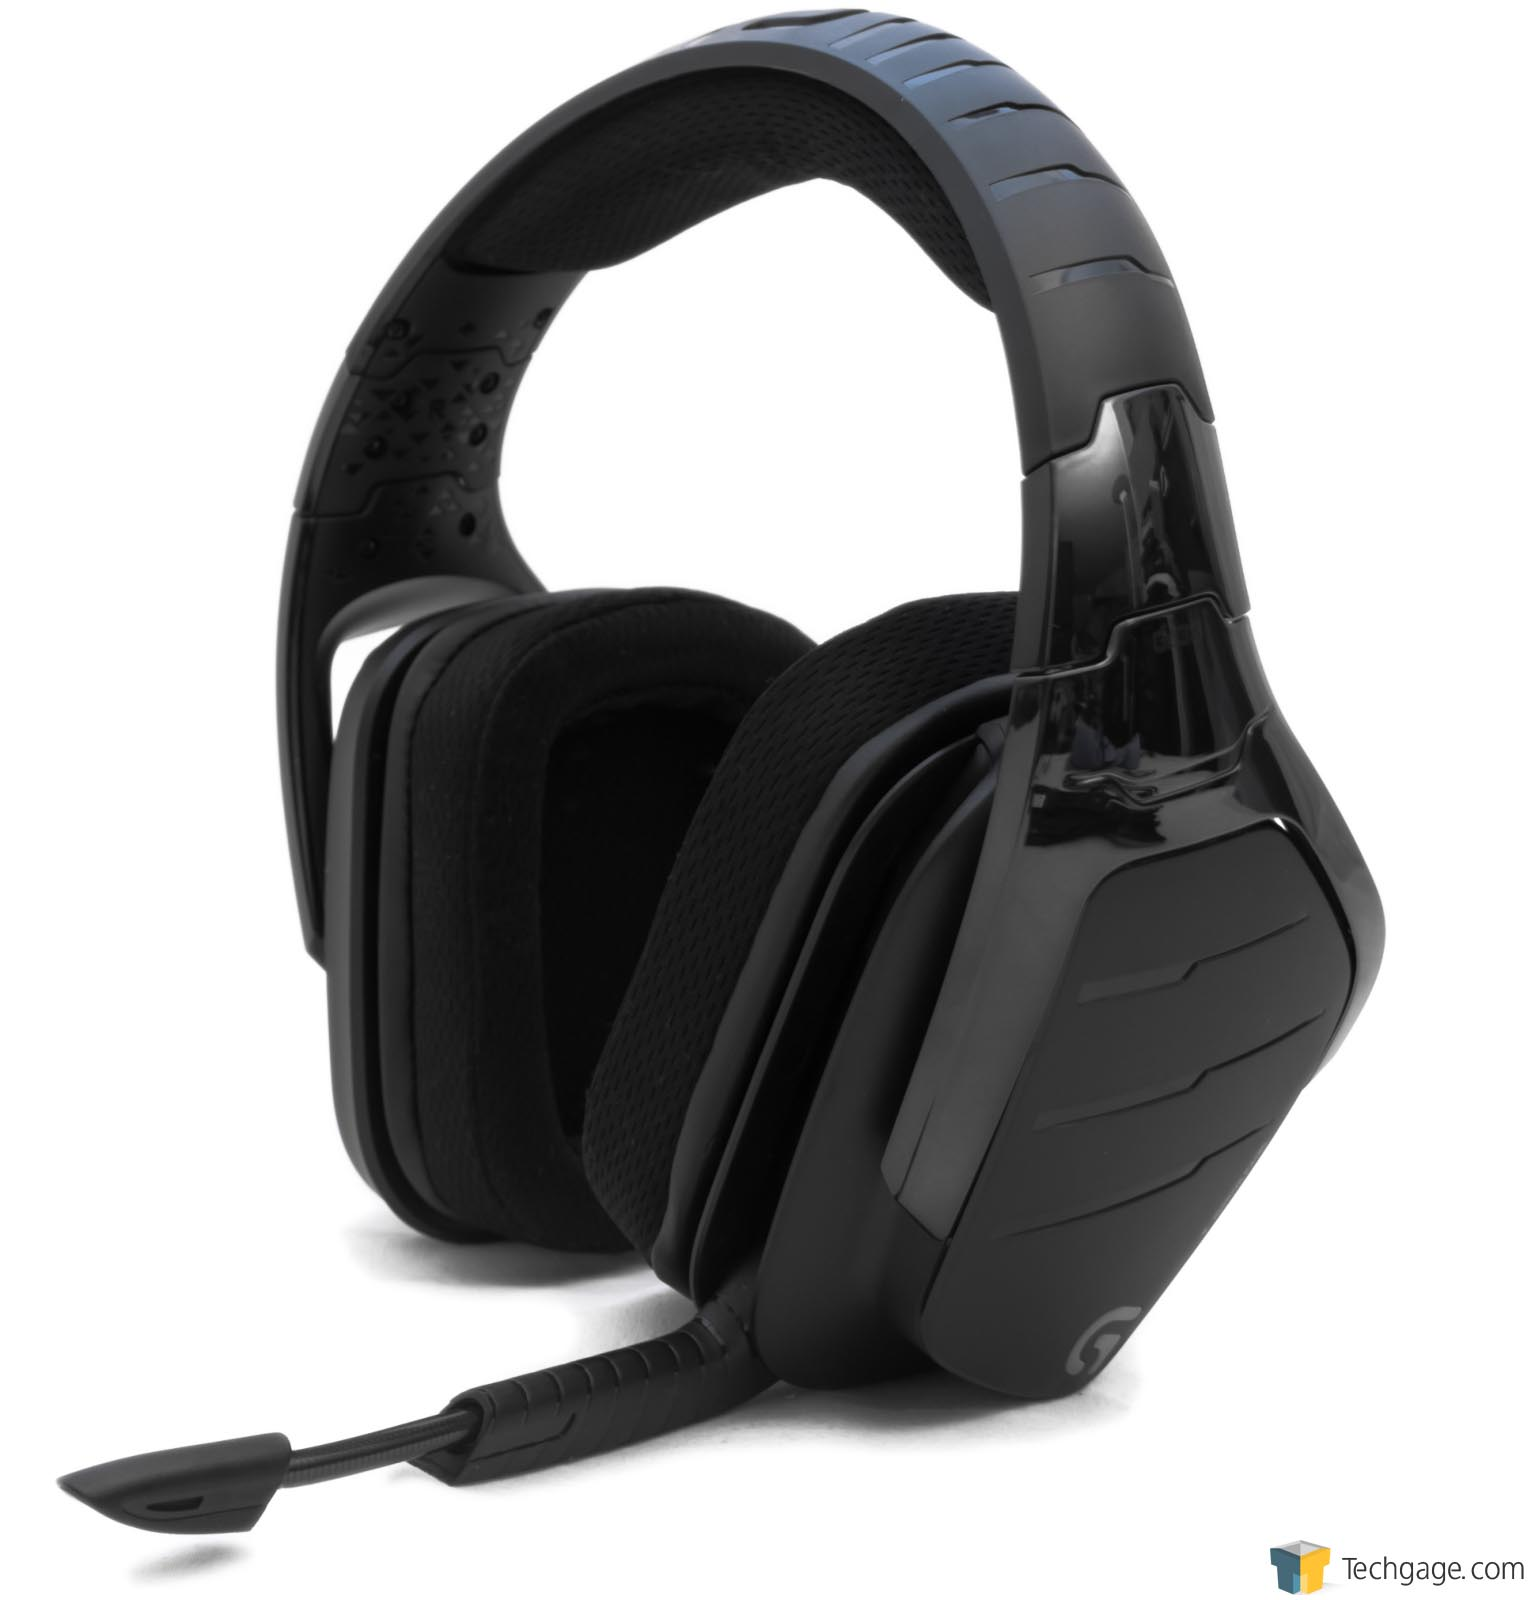 Logitech G633 Artemis Spectrum RGB 7.1 Surround Sound Headset Review – Techgage